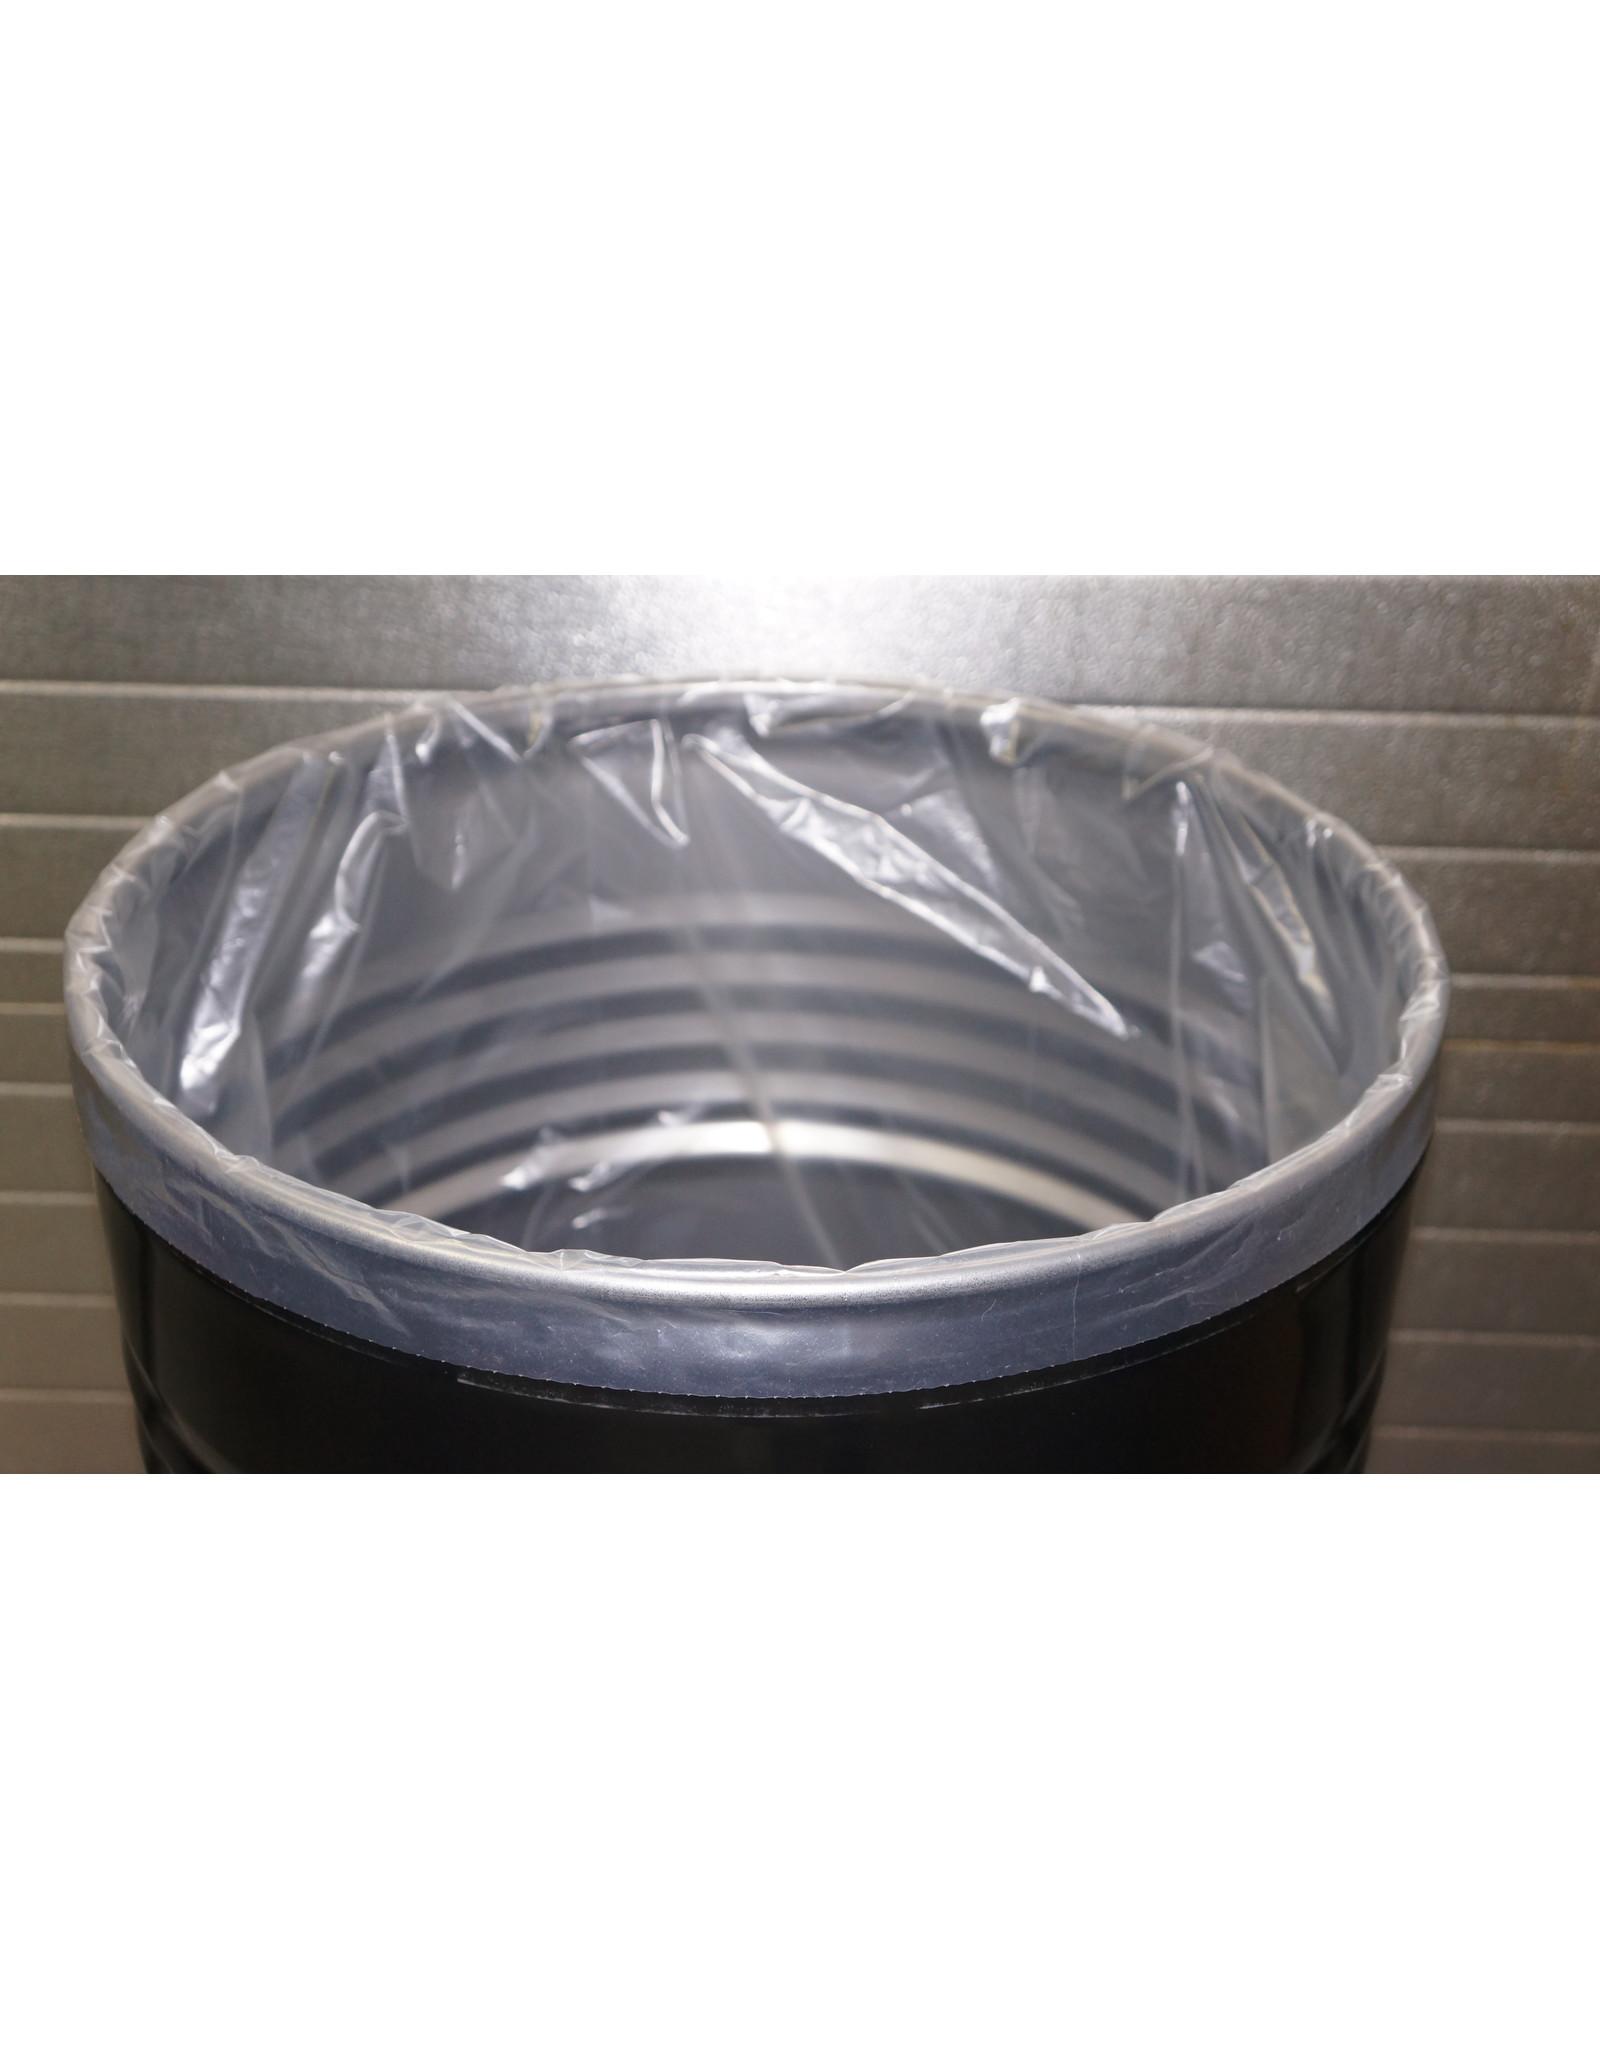 Barrelkings Garbage Bag BinBin 60 L Transparent 500 Pcs.